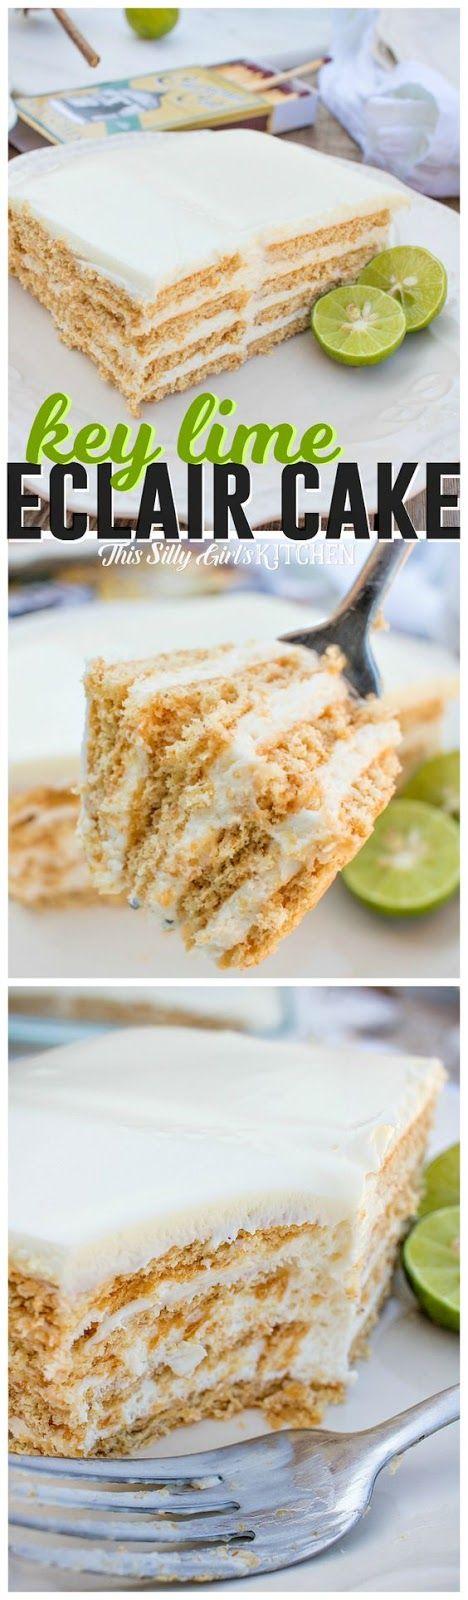 Key Lime Eclair Cake | Food And Cake Recipes